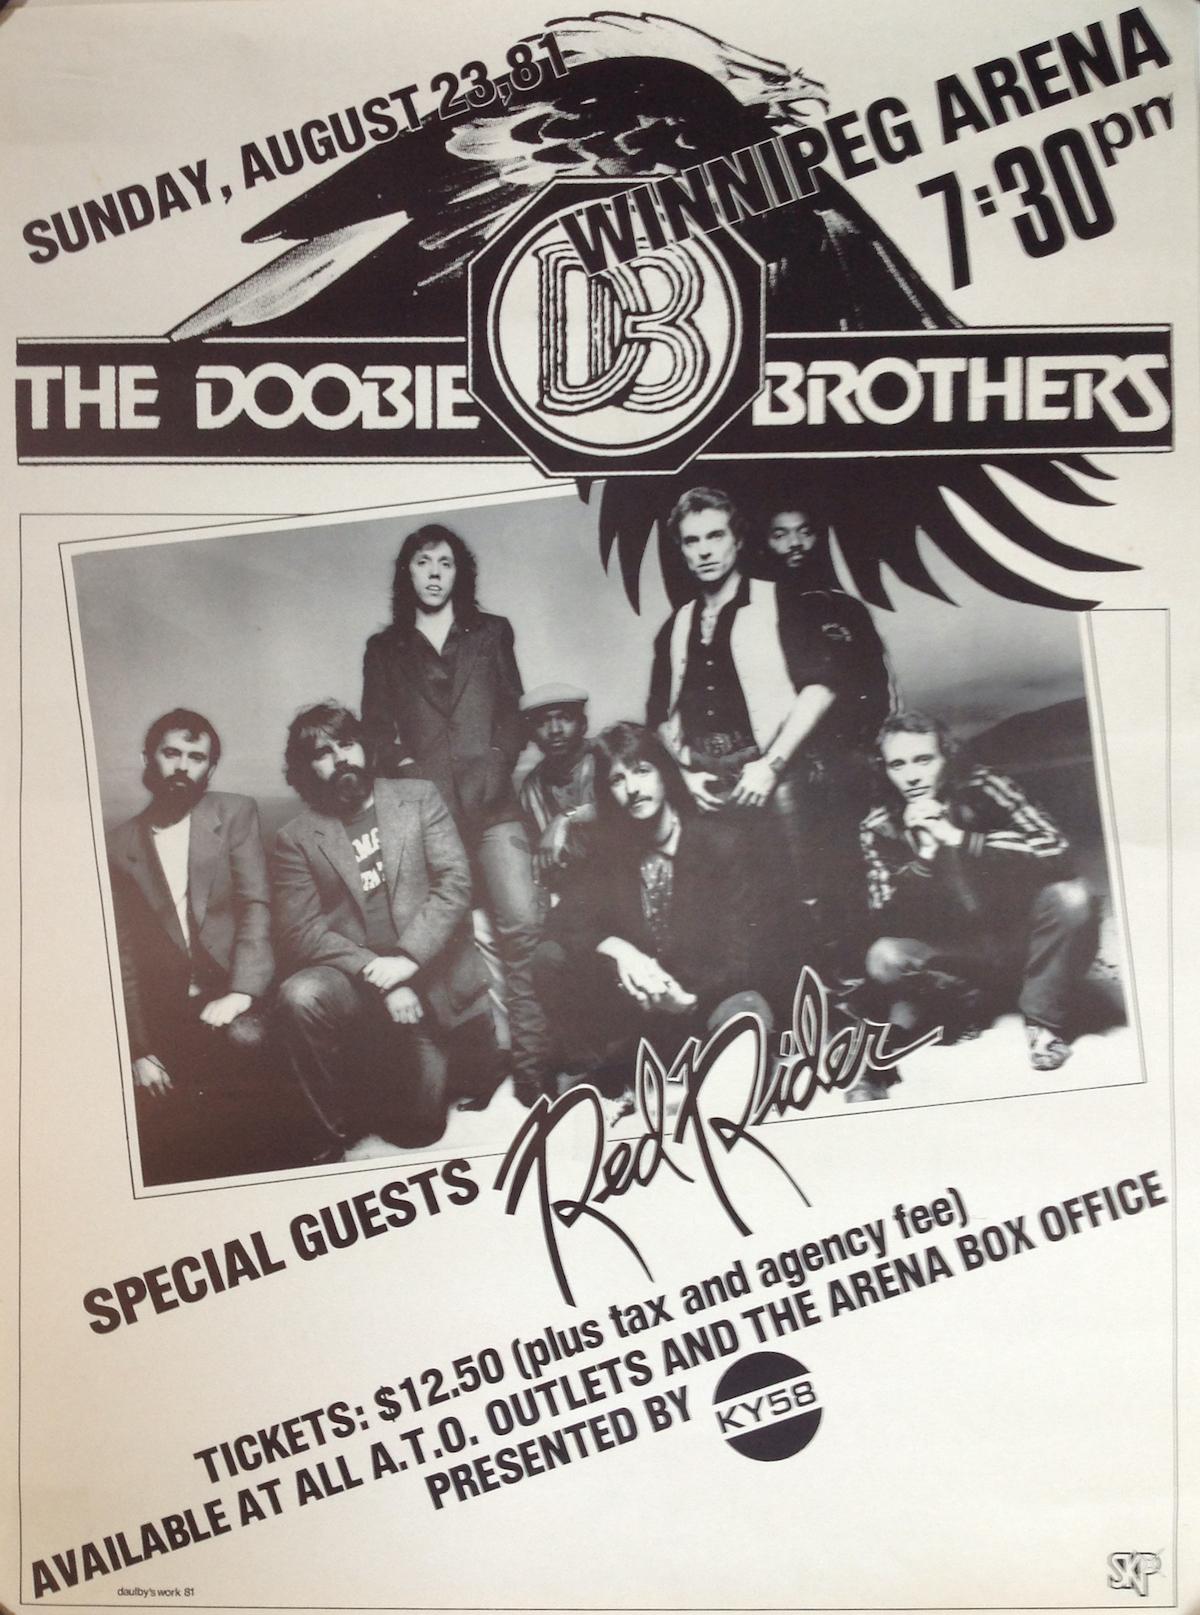 The Doobie Brothers | Rare 1981 Canadian Tour Poster - Tinnitist